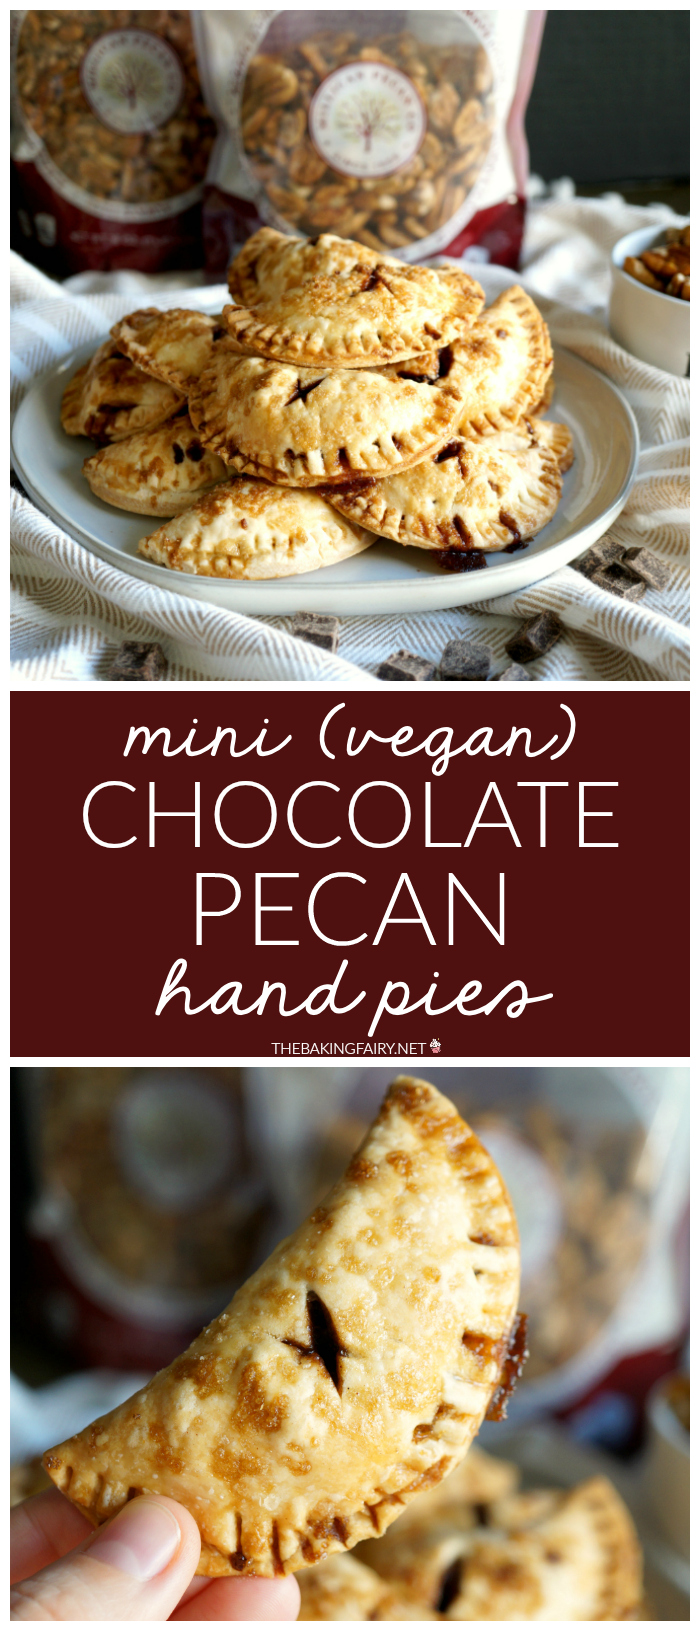 mini vegan chocolate pecan hand pies | The Baking Fairy #FallFlavors #ad